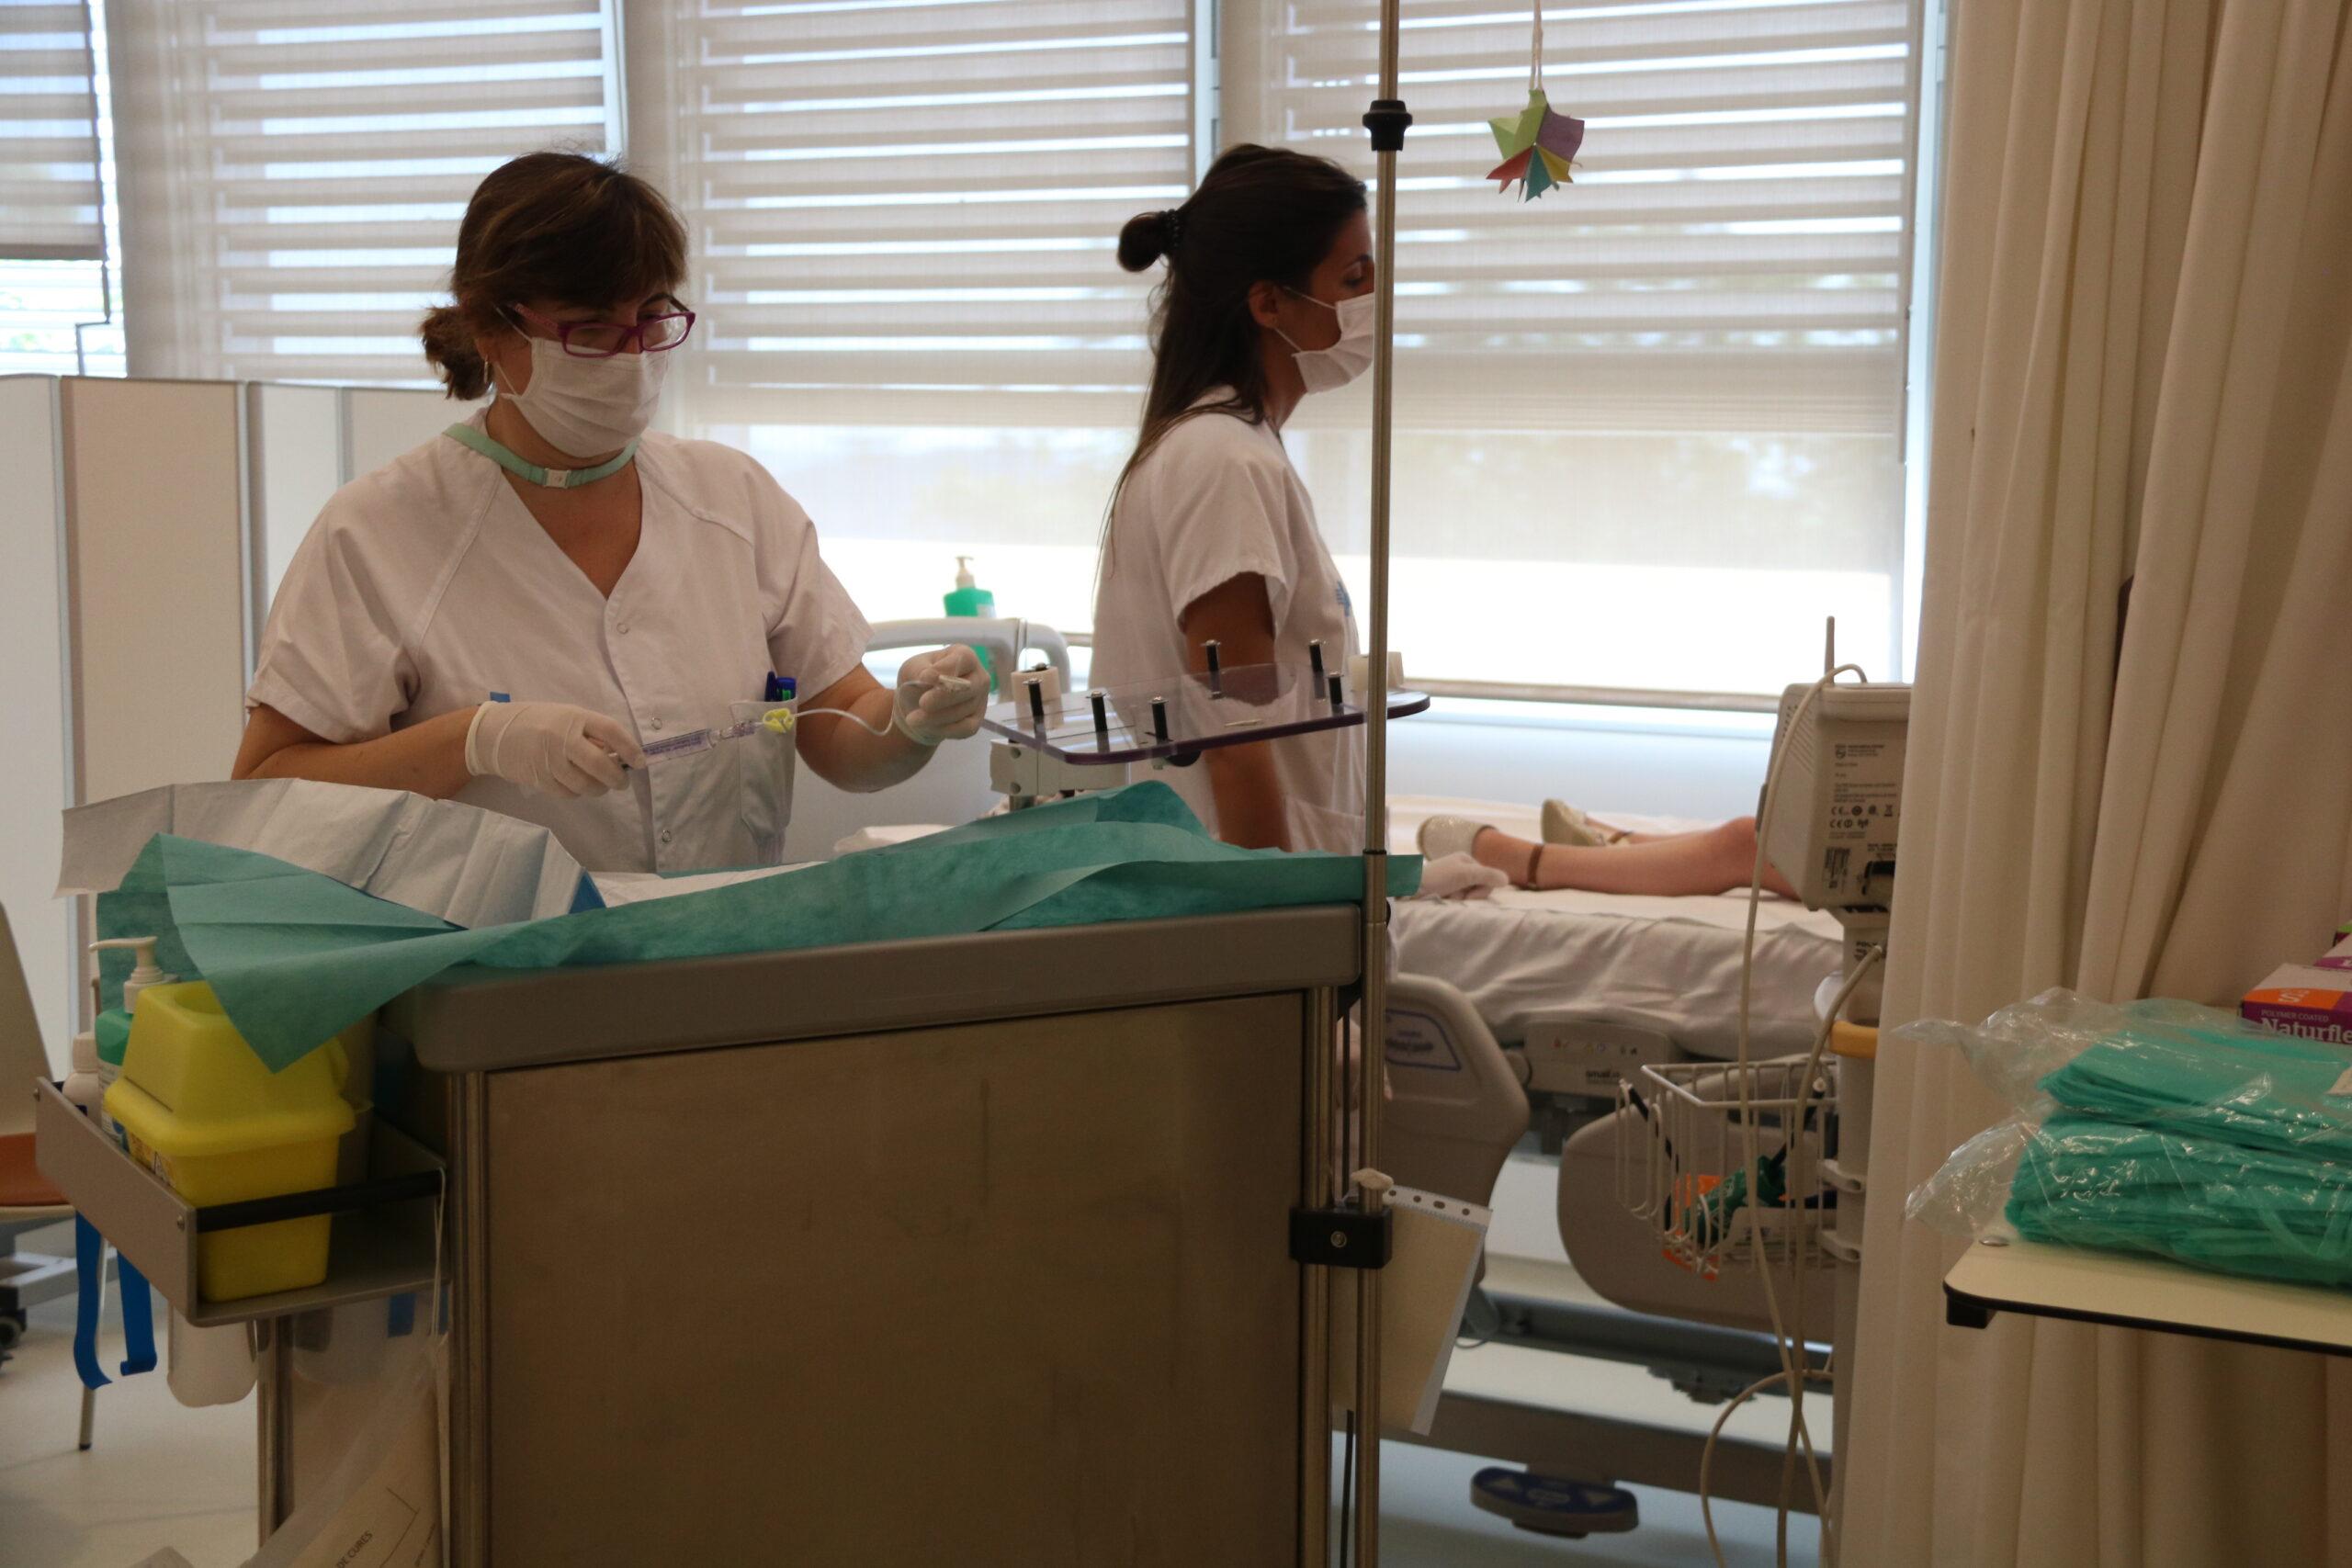 Dues infermeres atenen un infant a la Vall d'Hebron ACN